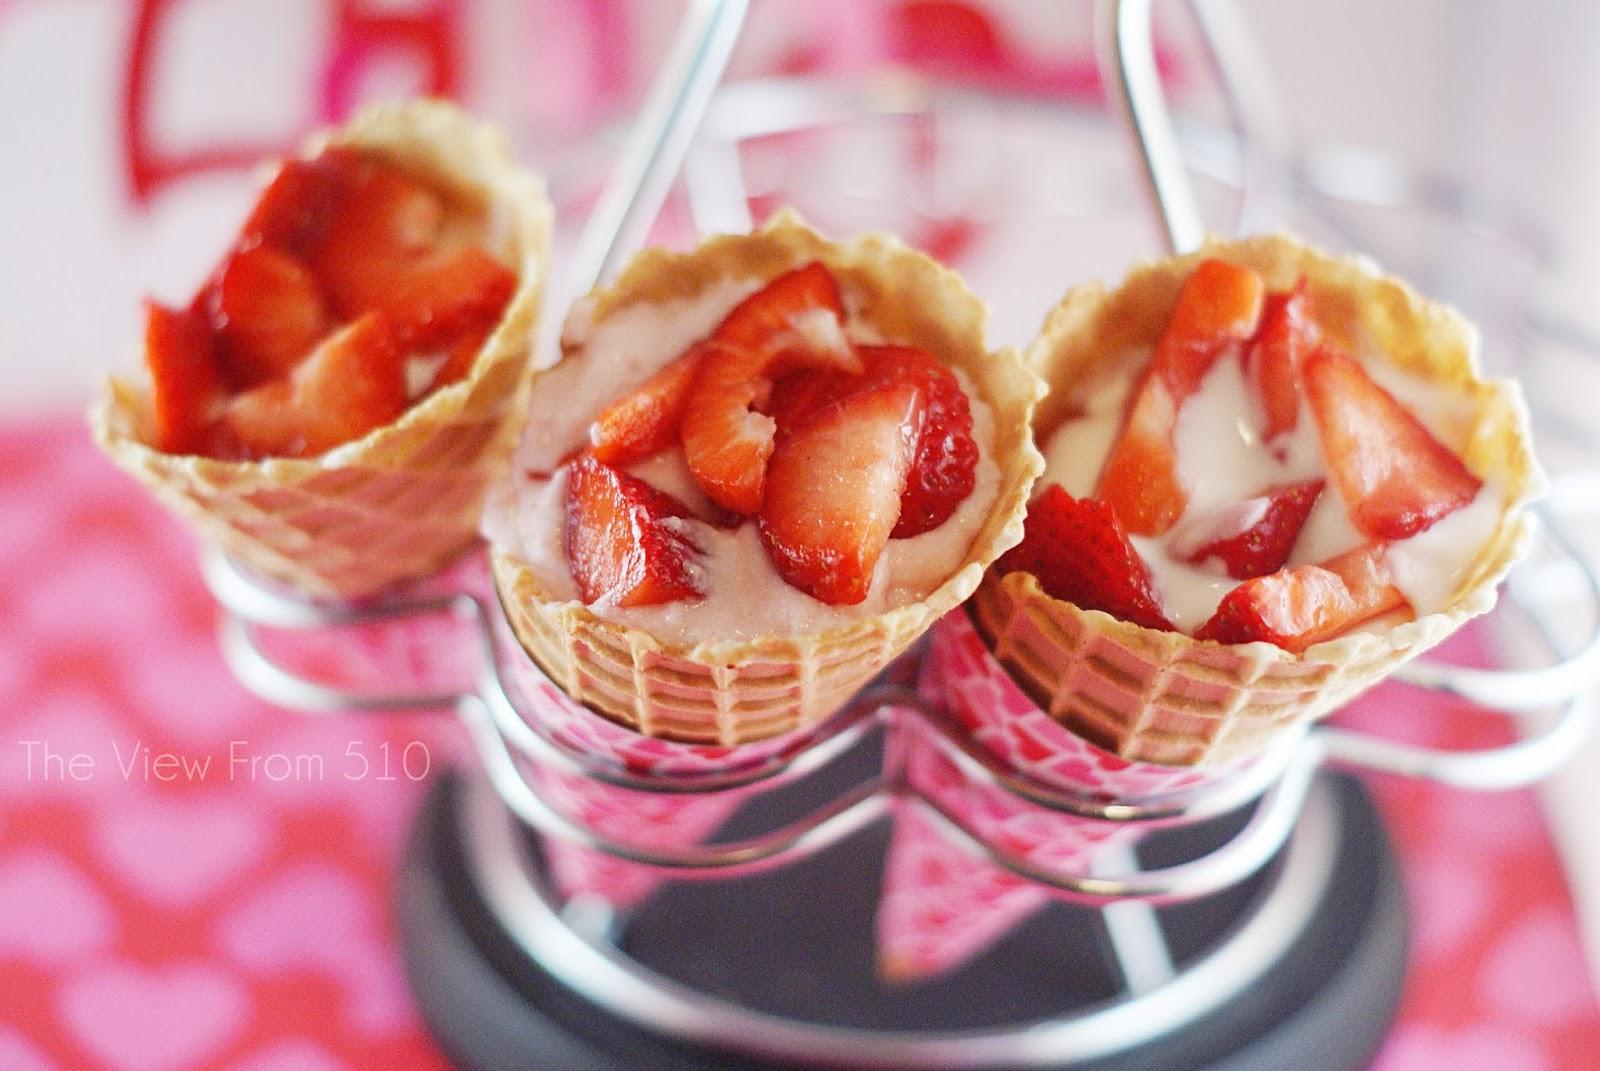 Strawberry Yogurt Cones #recipe #sponsored